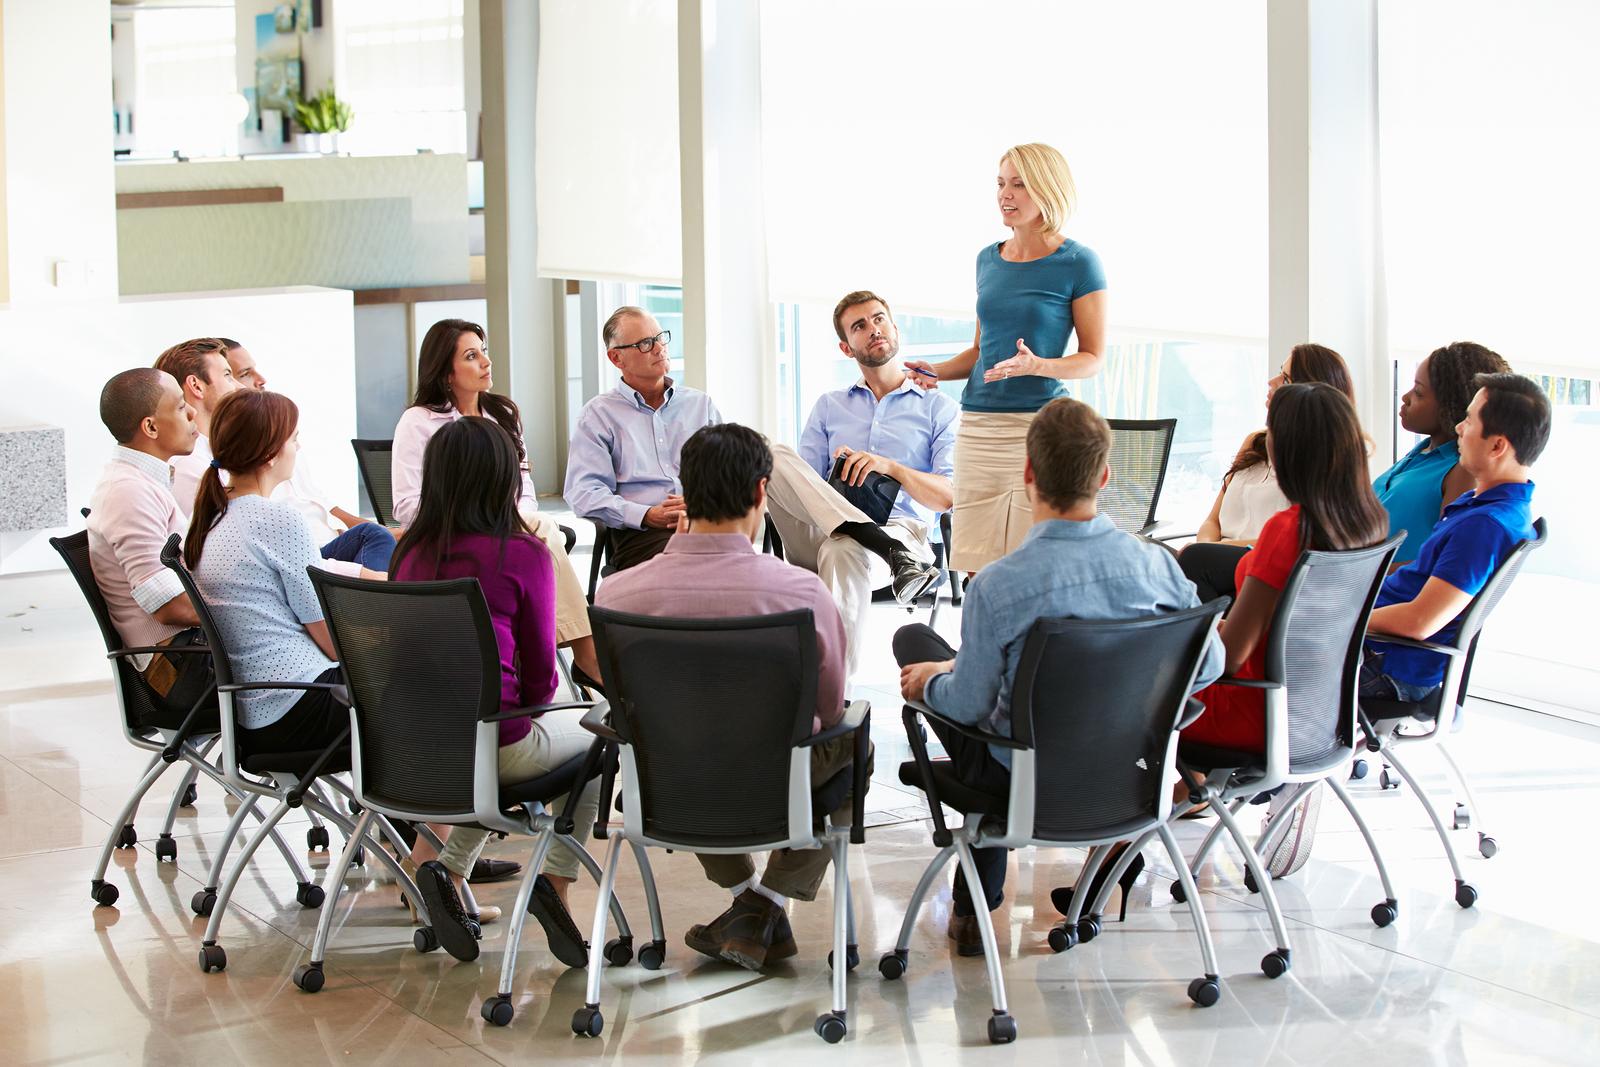 bigstock-Businesswoman-Addressing-Multi-59300408